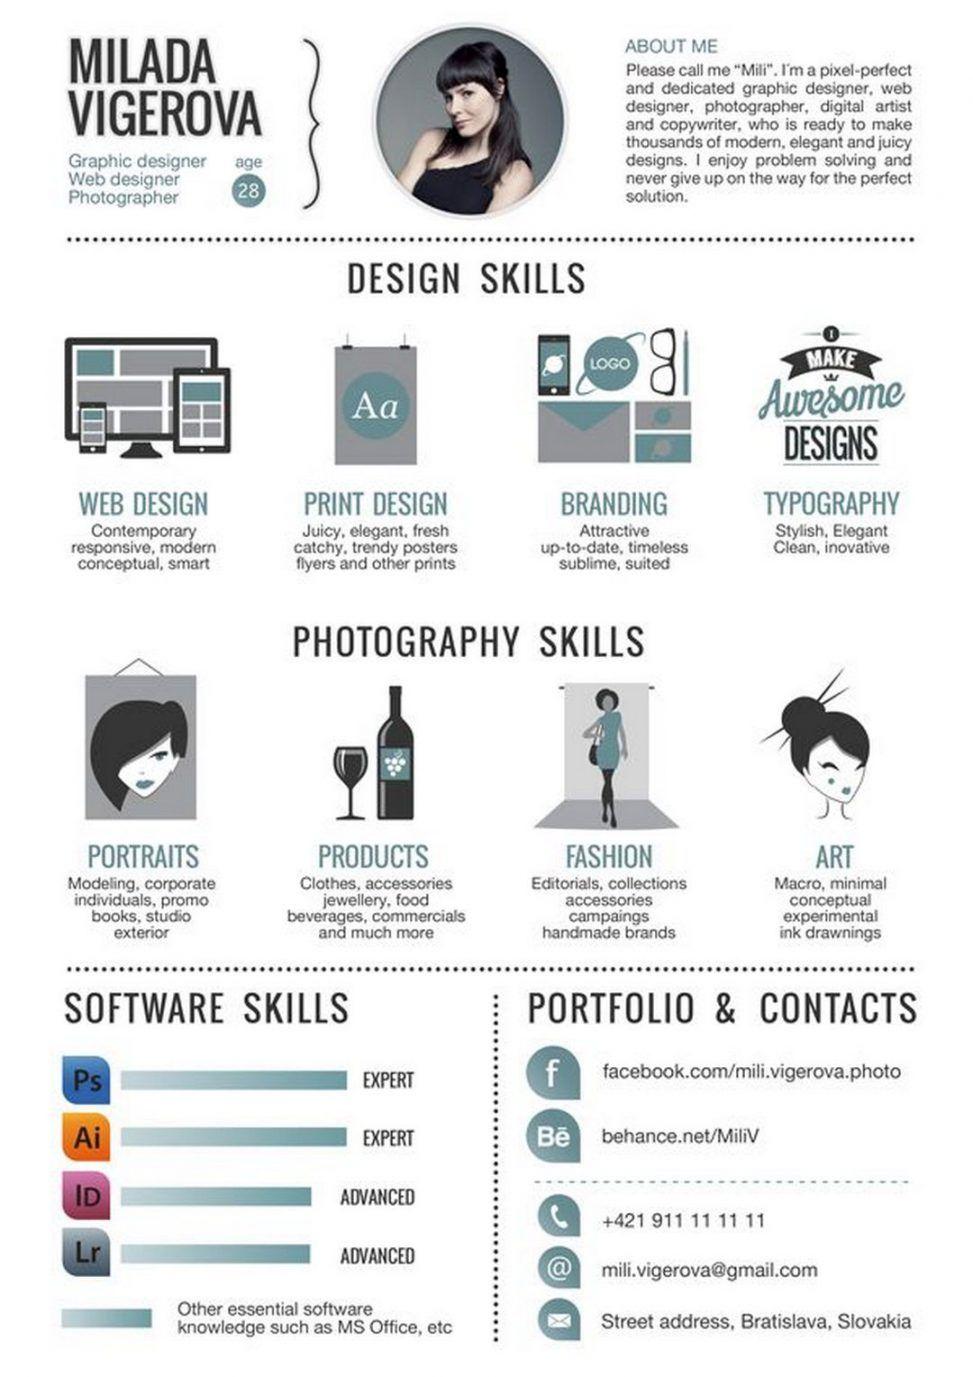 Web Designer Resume Examples Cover Letter For Web Designer And